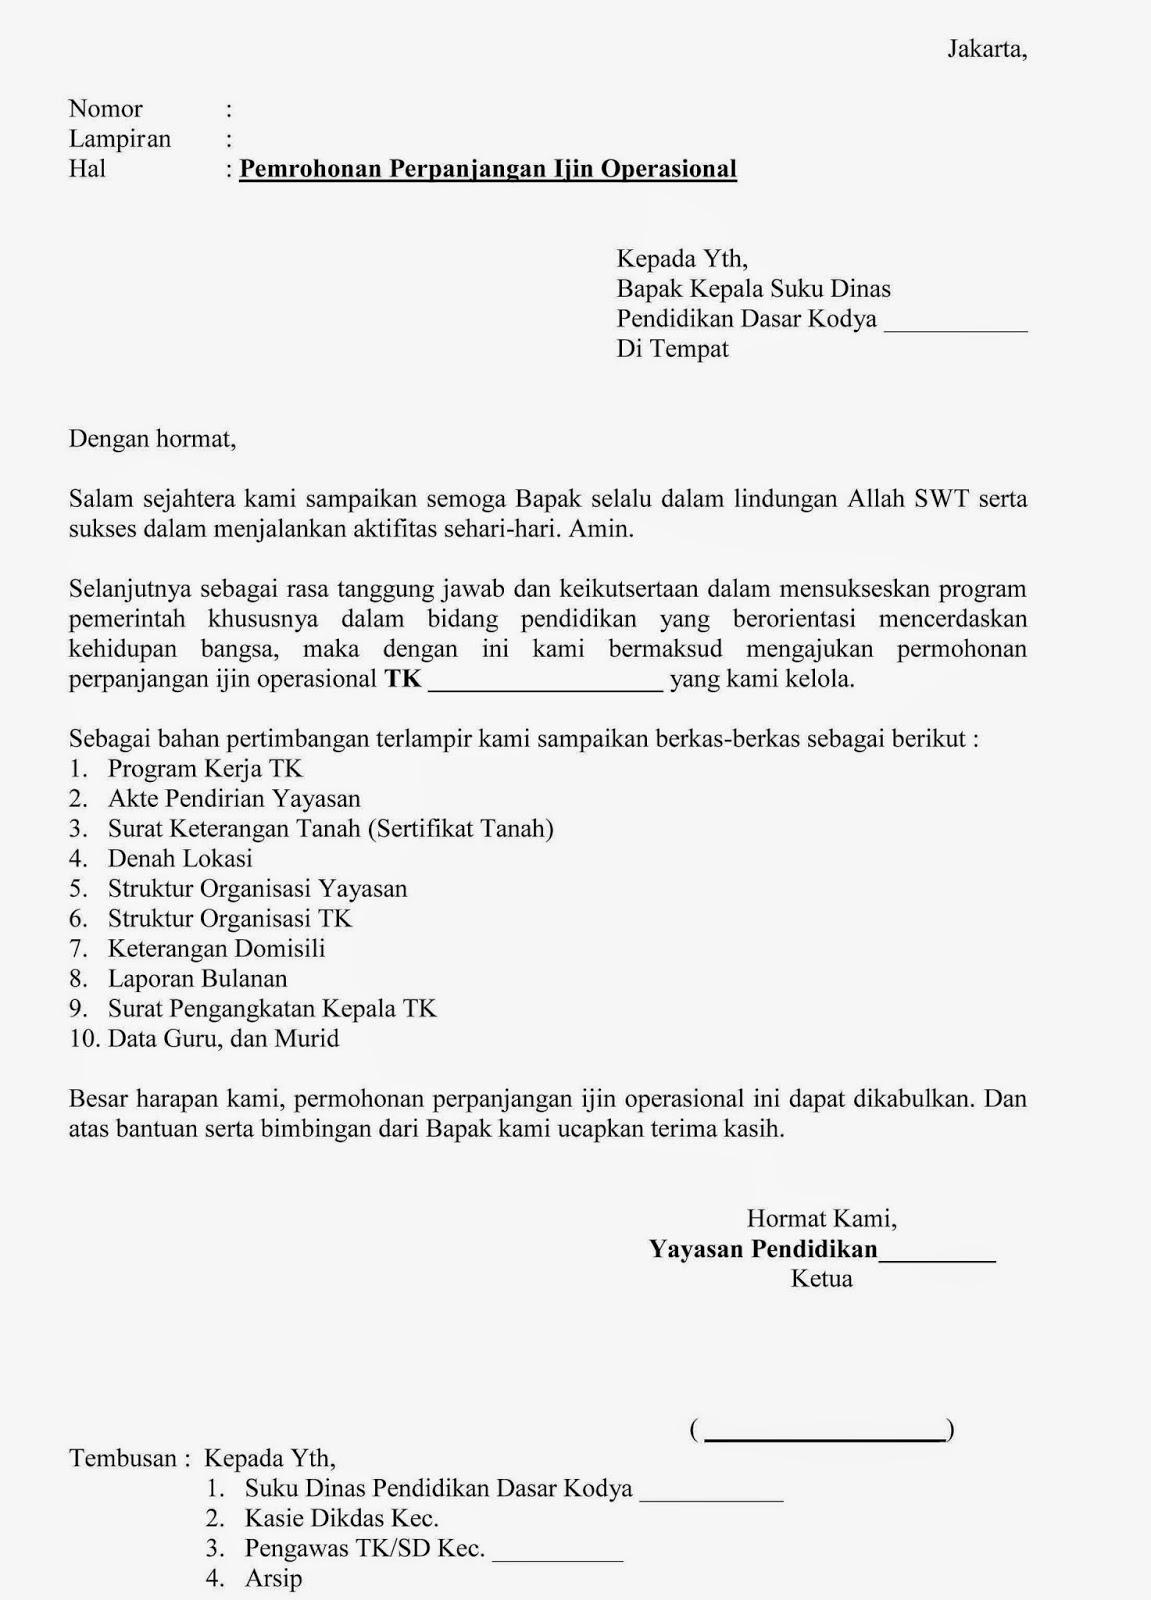 Contoh Surat Permohonan Perpanjangan Izin Operasional Tk